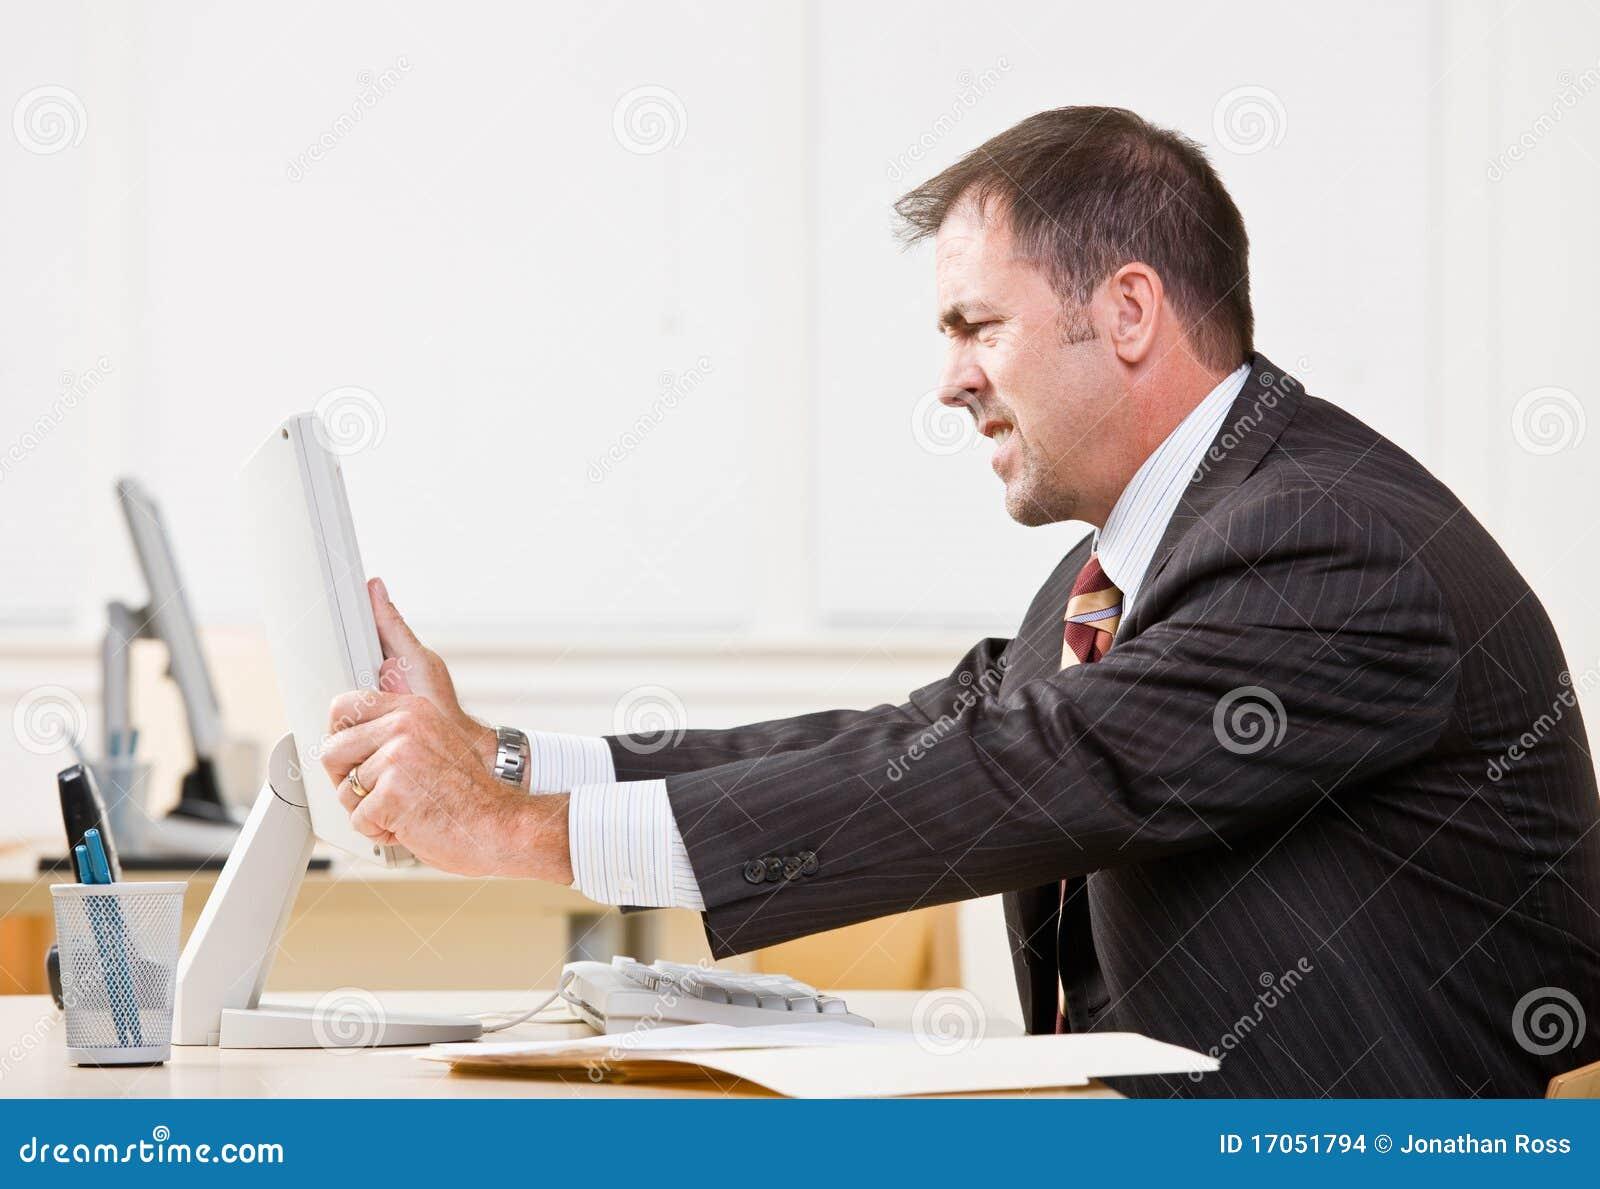 businessman adjusting computer monitor stock images